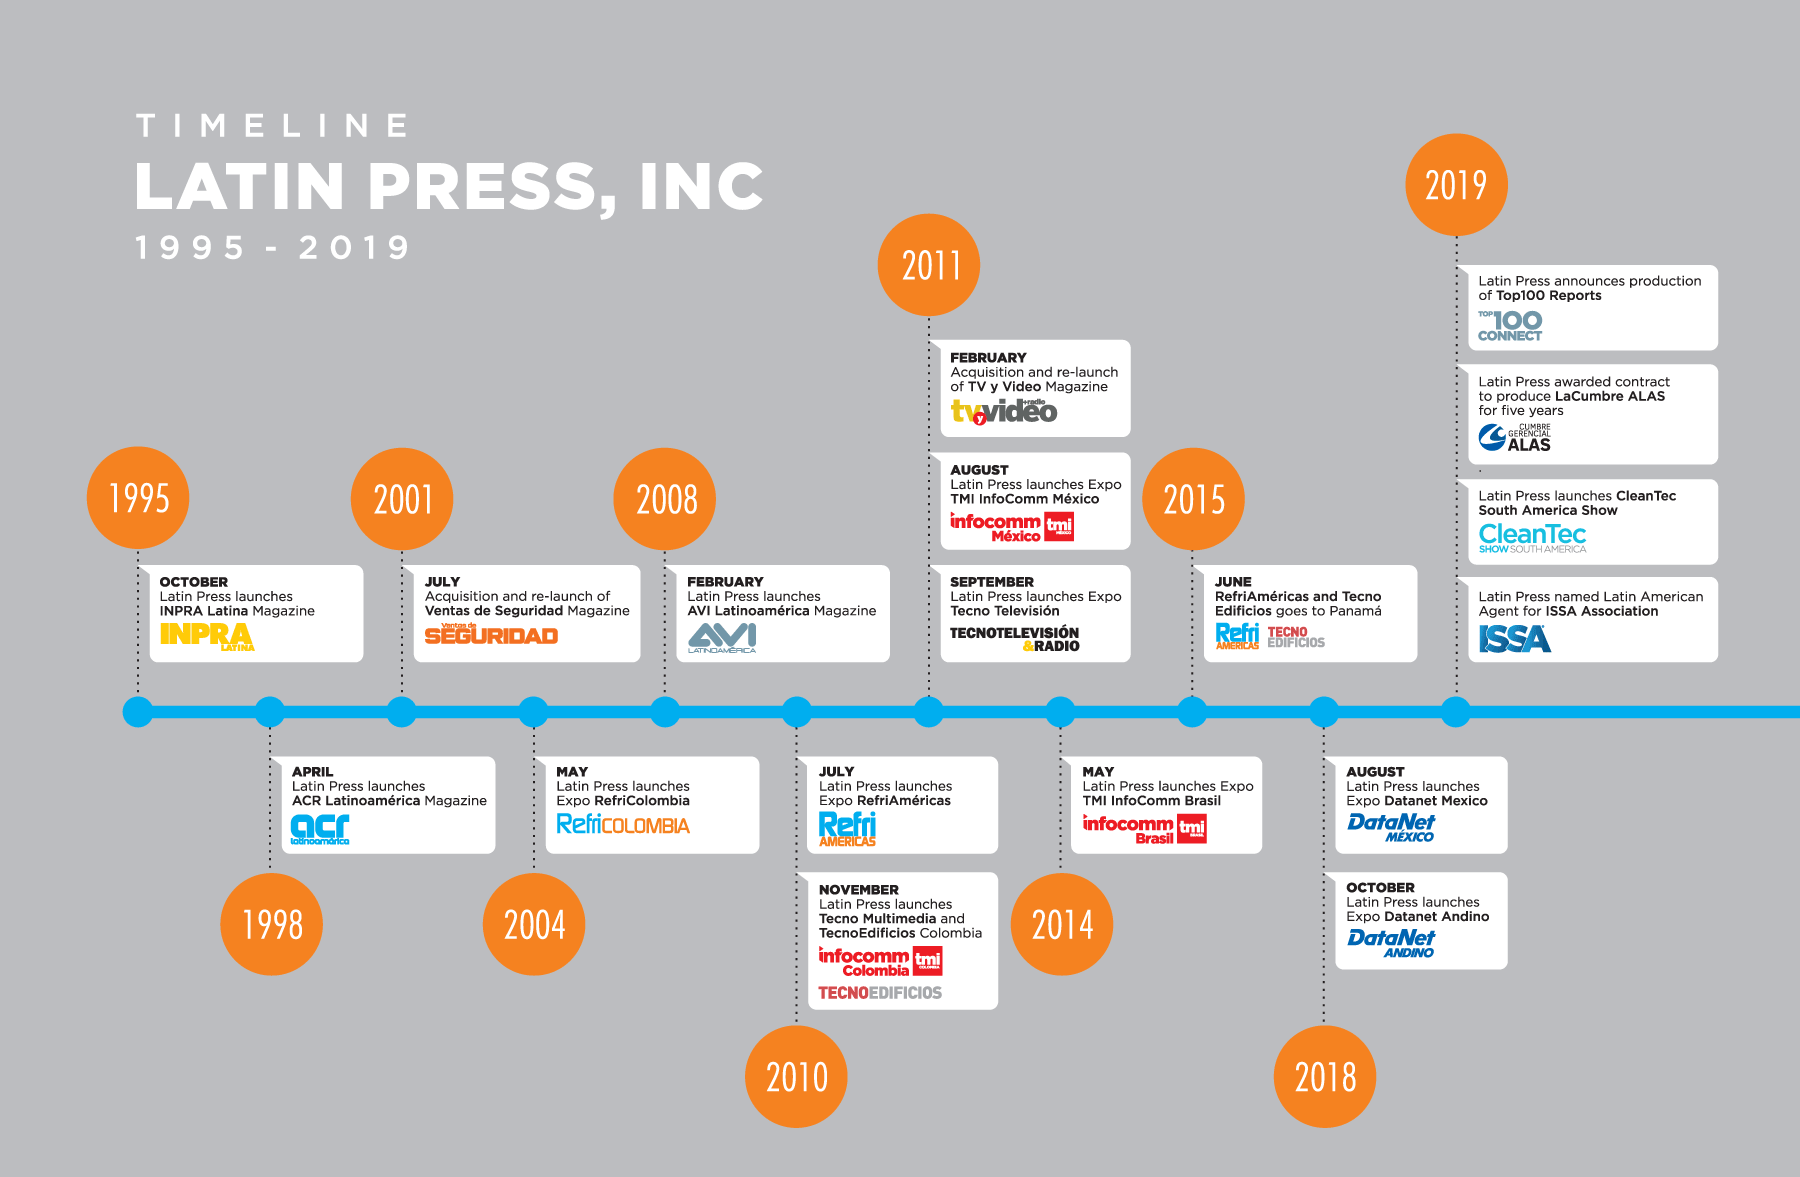 Latin Press Timeline